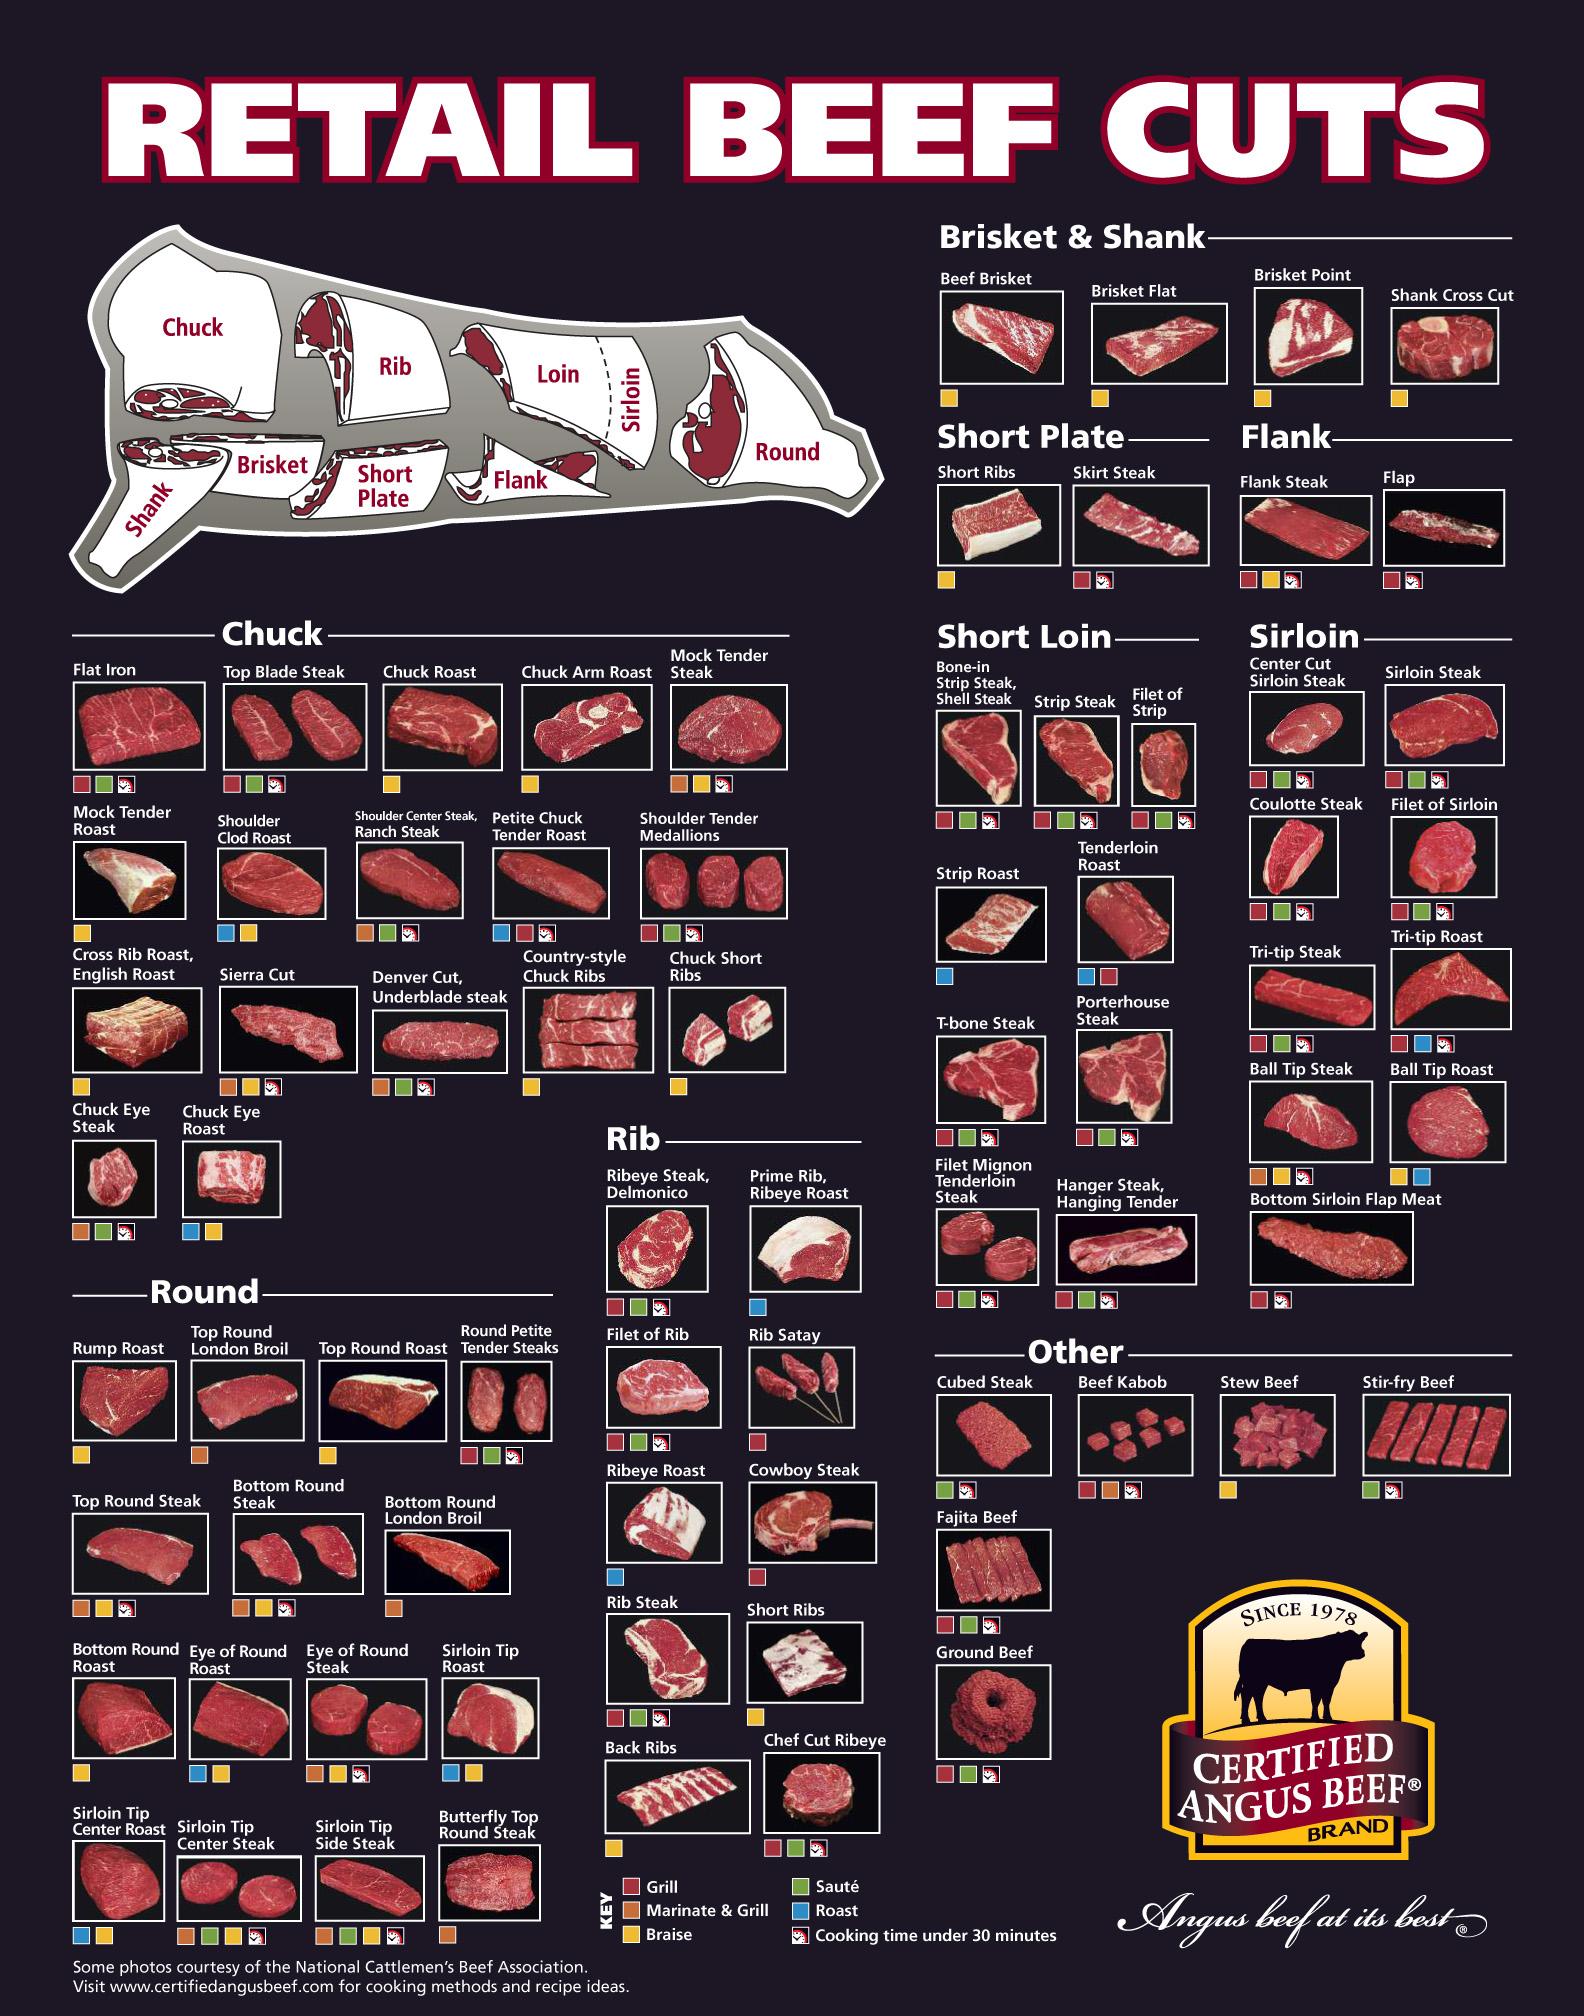 Tucker's Black Angus Ranch - Retail Beef Cuts